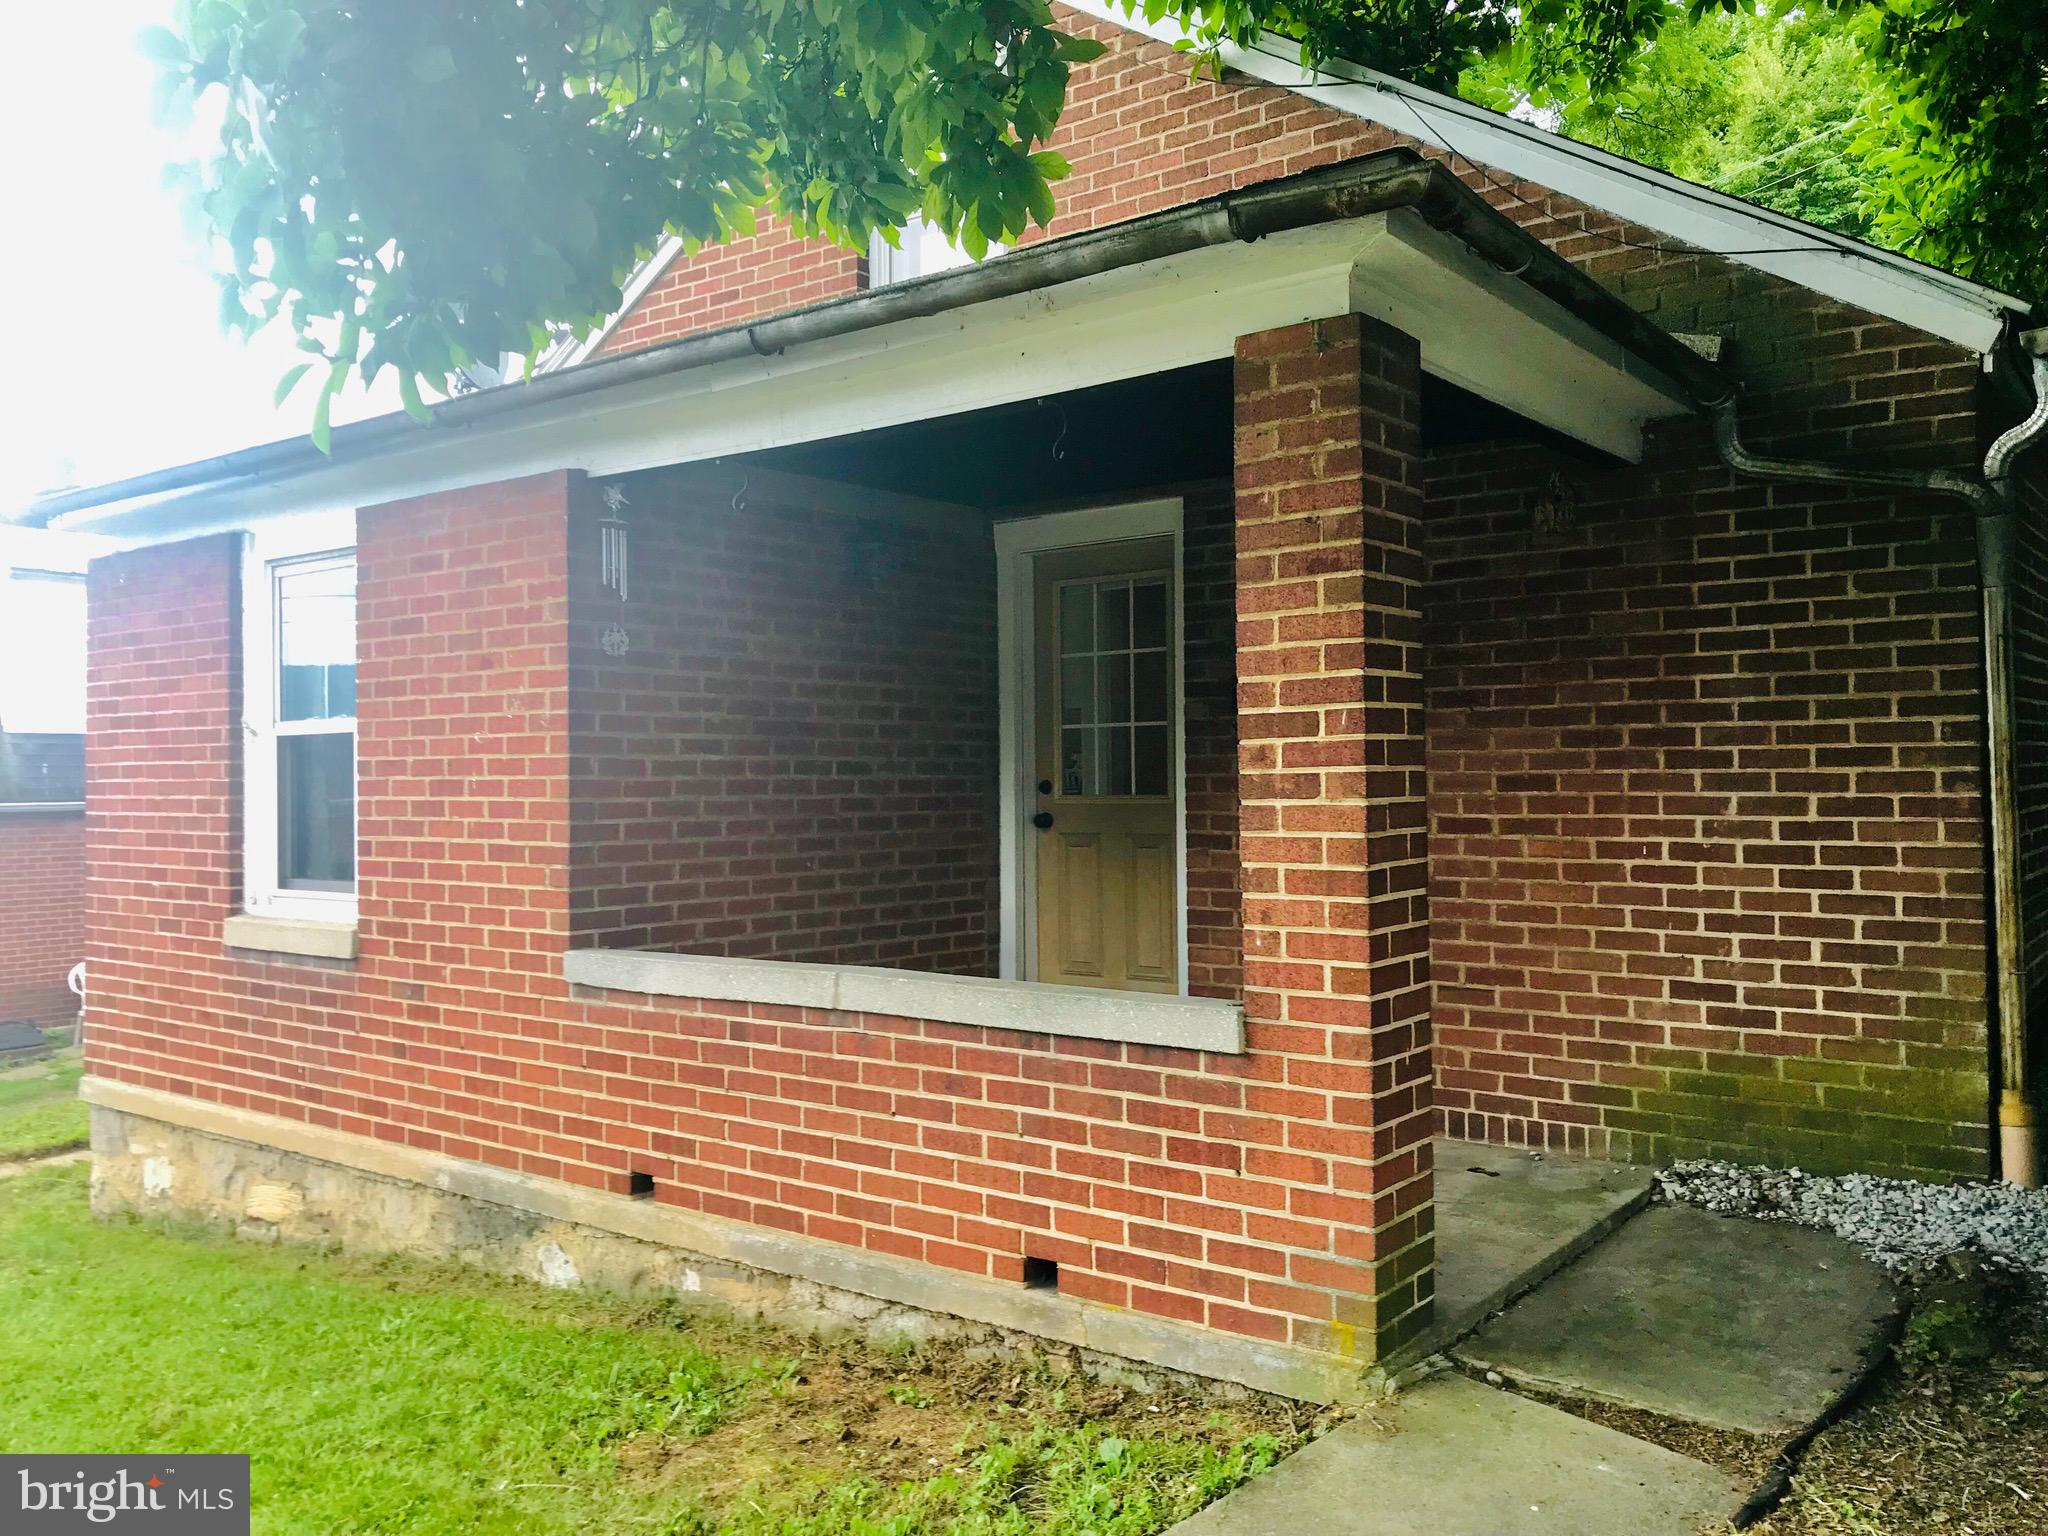 732 WILLOWBANK STREET, BELLEFONTE, PA 16823